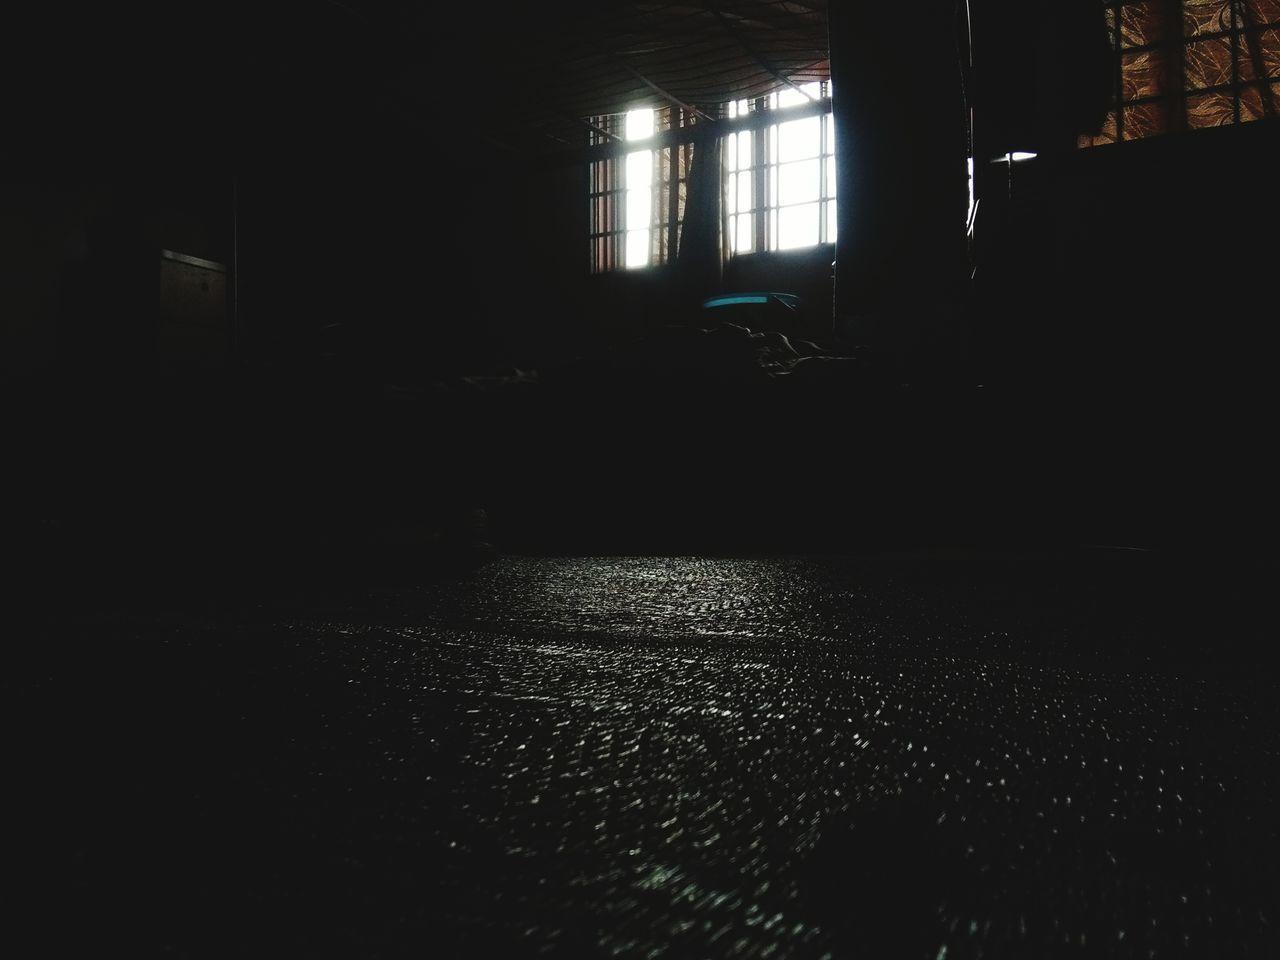 indoors, no people, illuminated, night